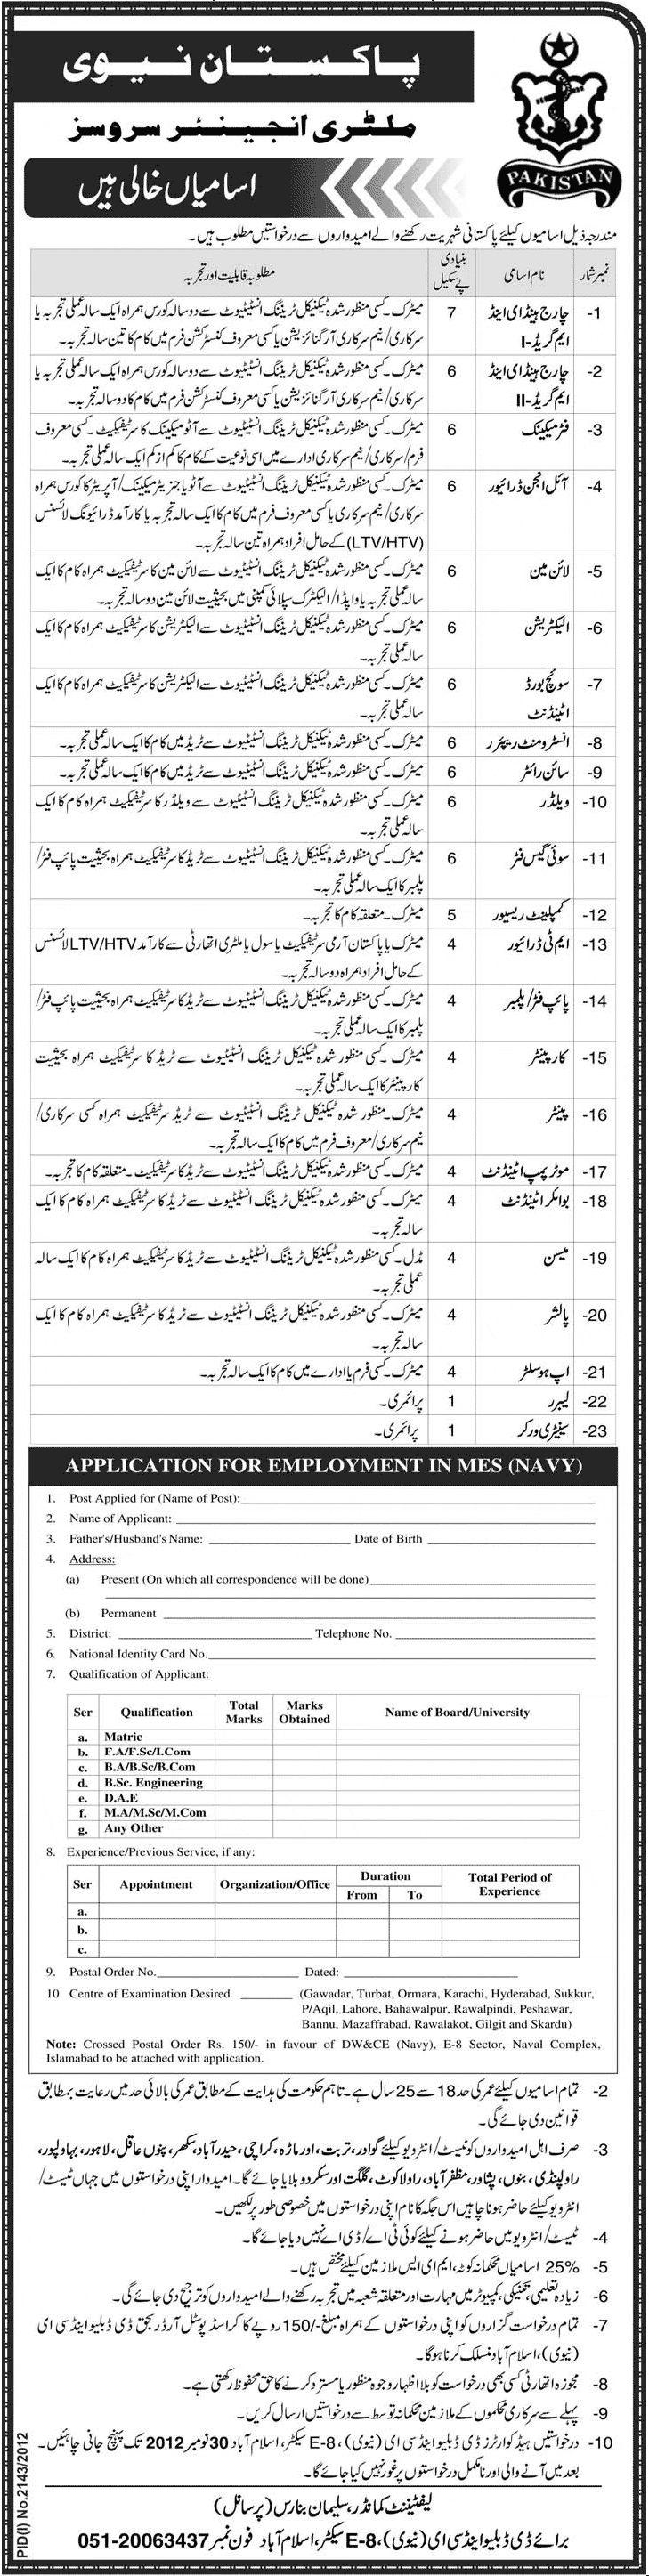 Cv Resume Meaning In Urdu - Idalias Salon